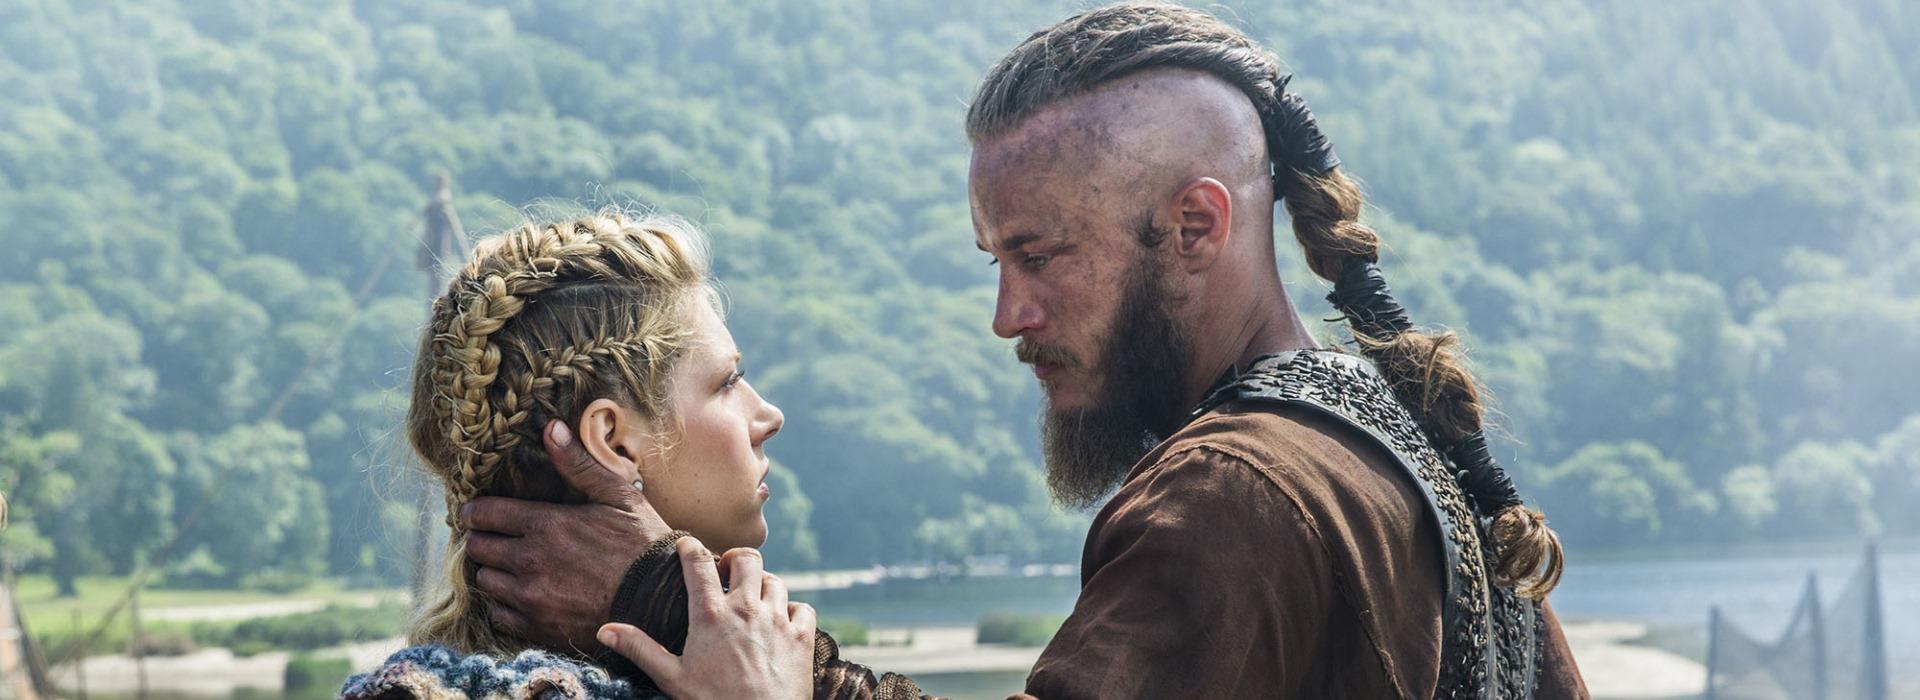 Vikings season 1 [Blu-Ray] 720p cover